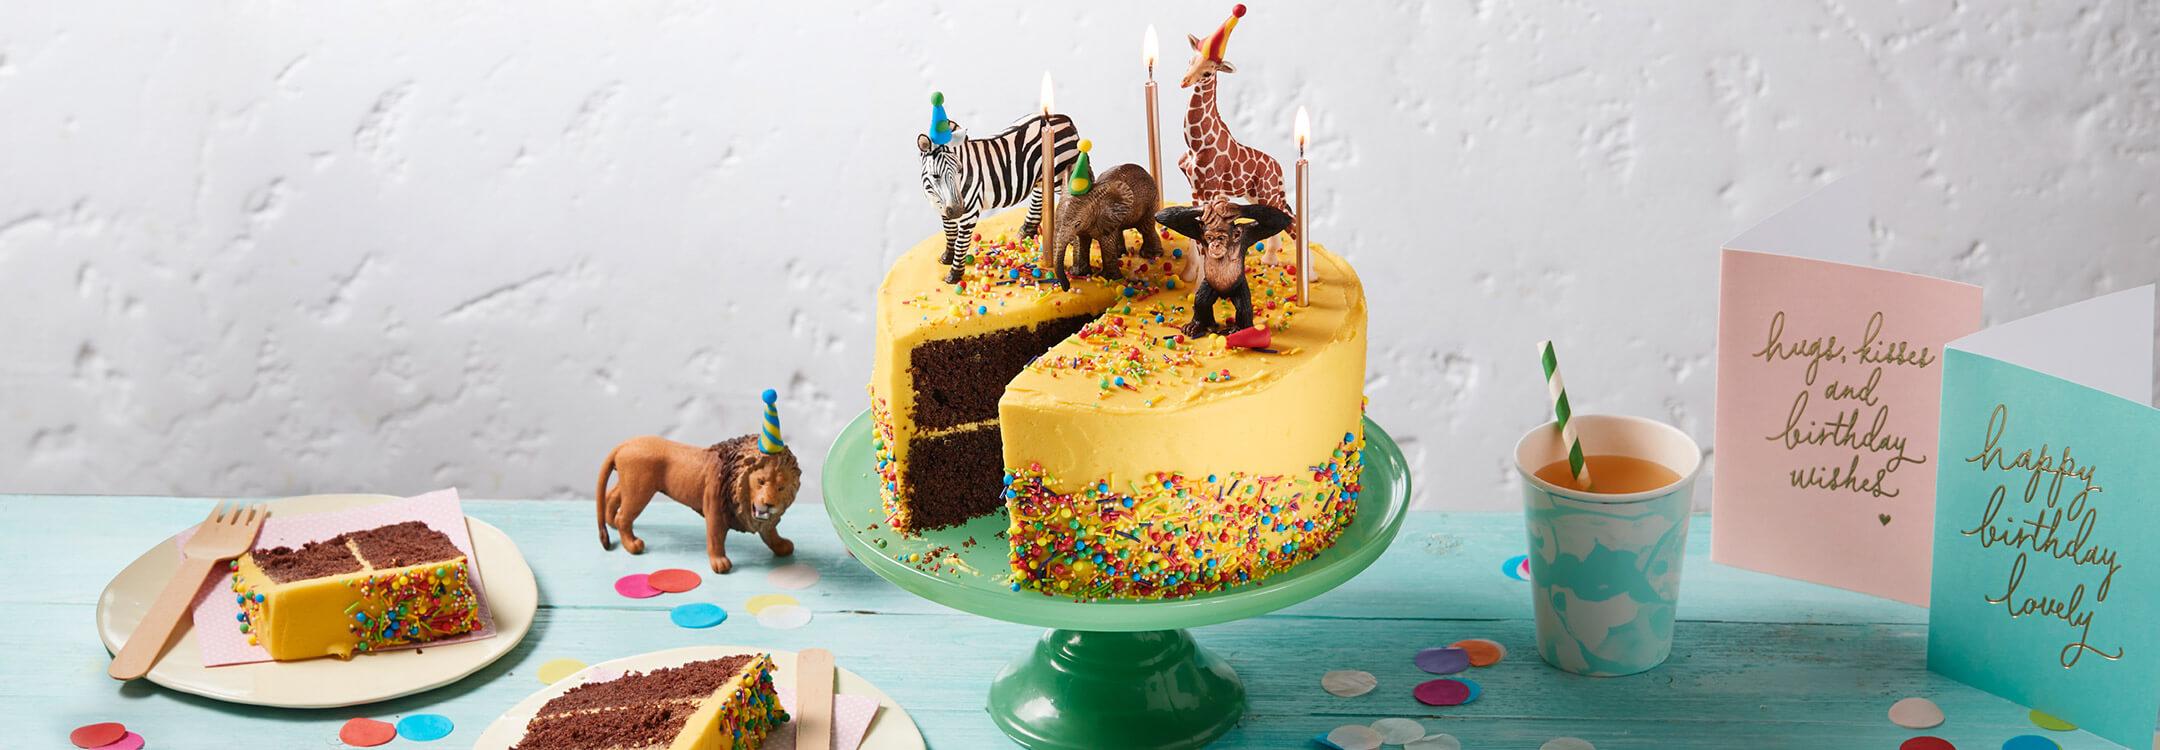 Astounding Jungle Birthday Cake Dr Oetker Funny Birthday Cards Online Inifodamsfinfo